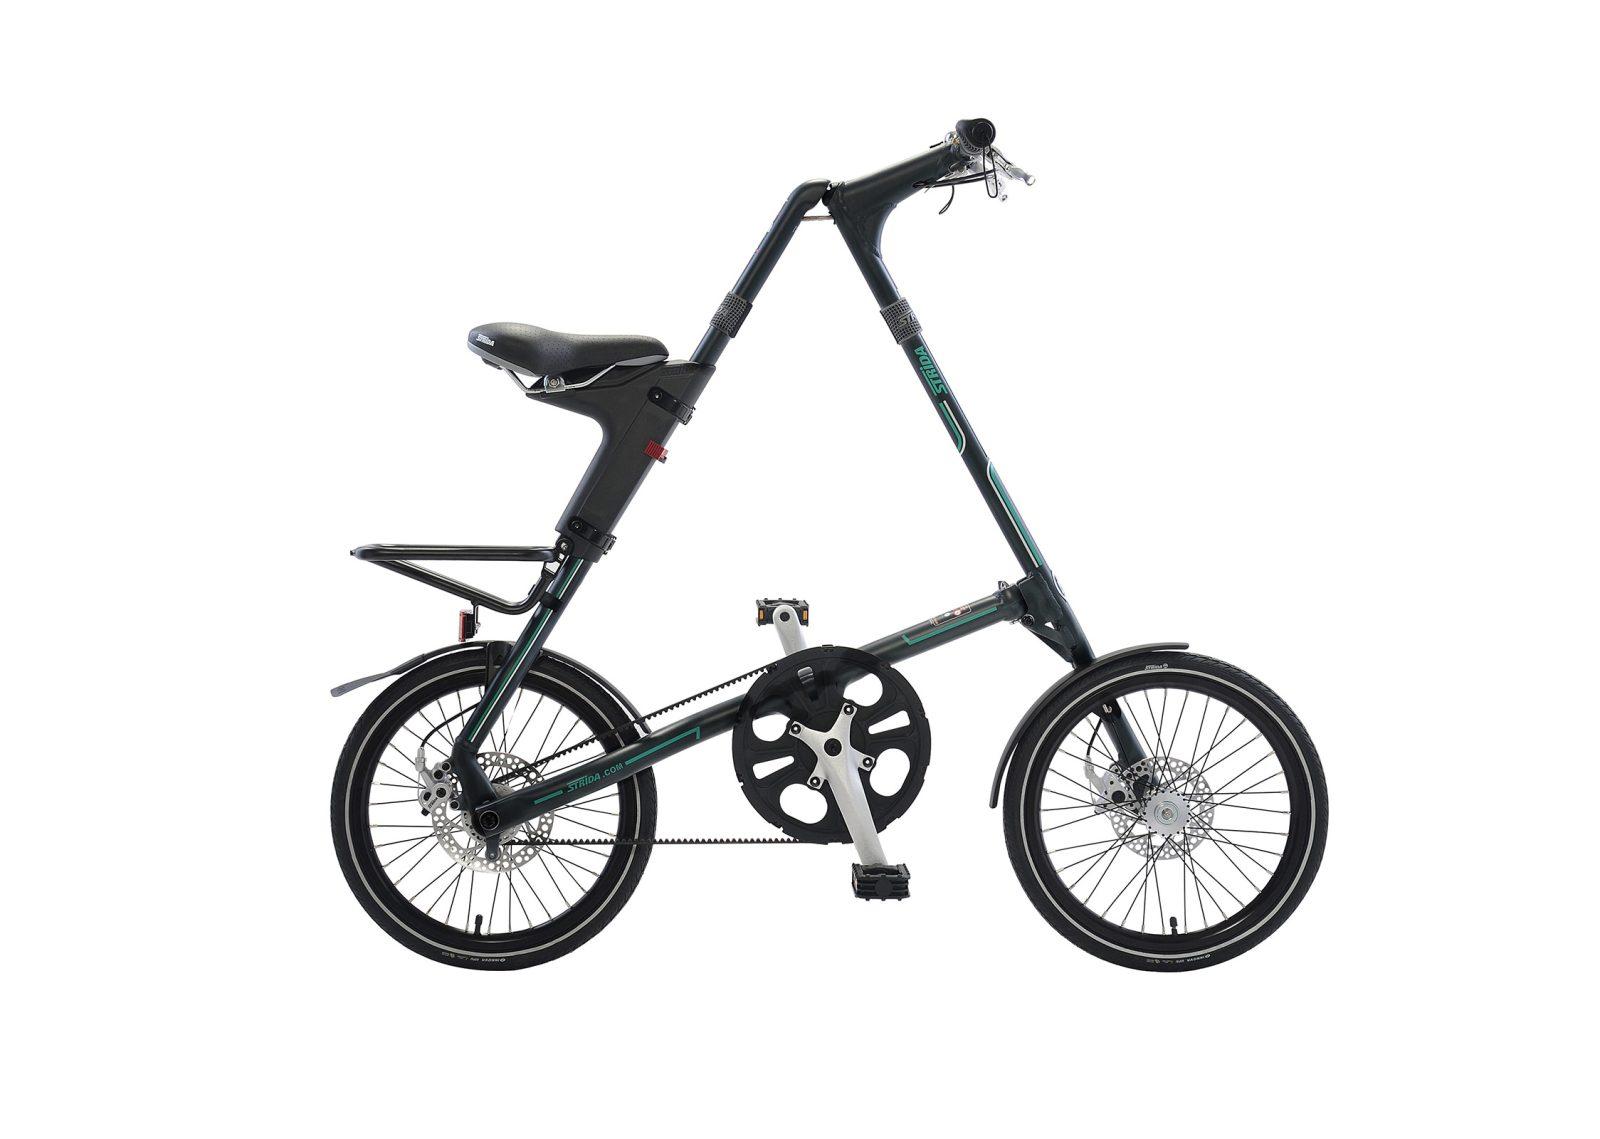 STRiDA SX Folding Bicycle, Black-31750